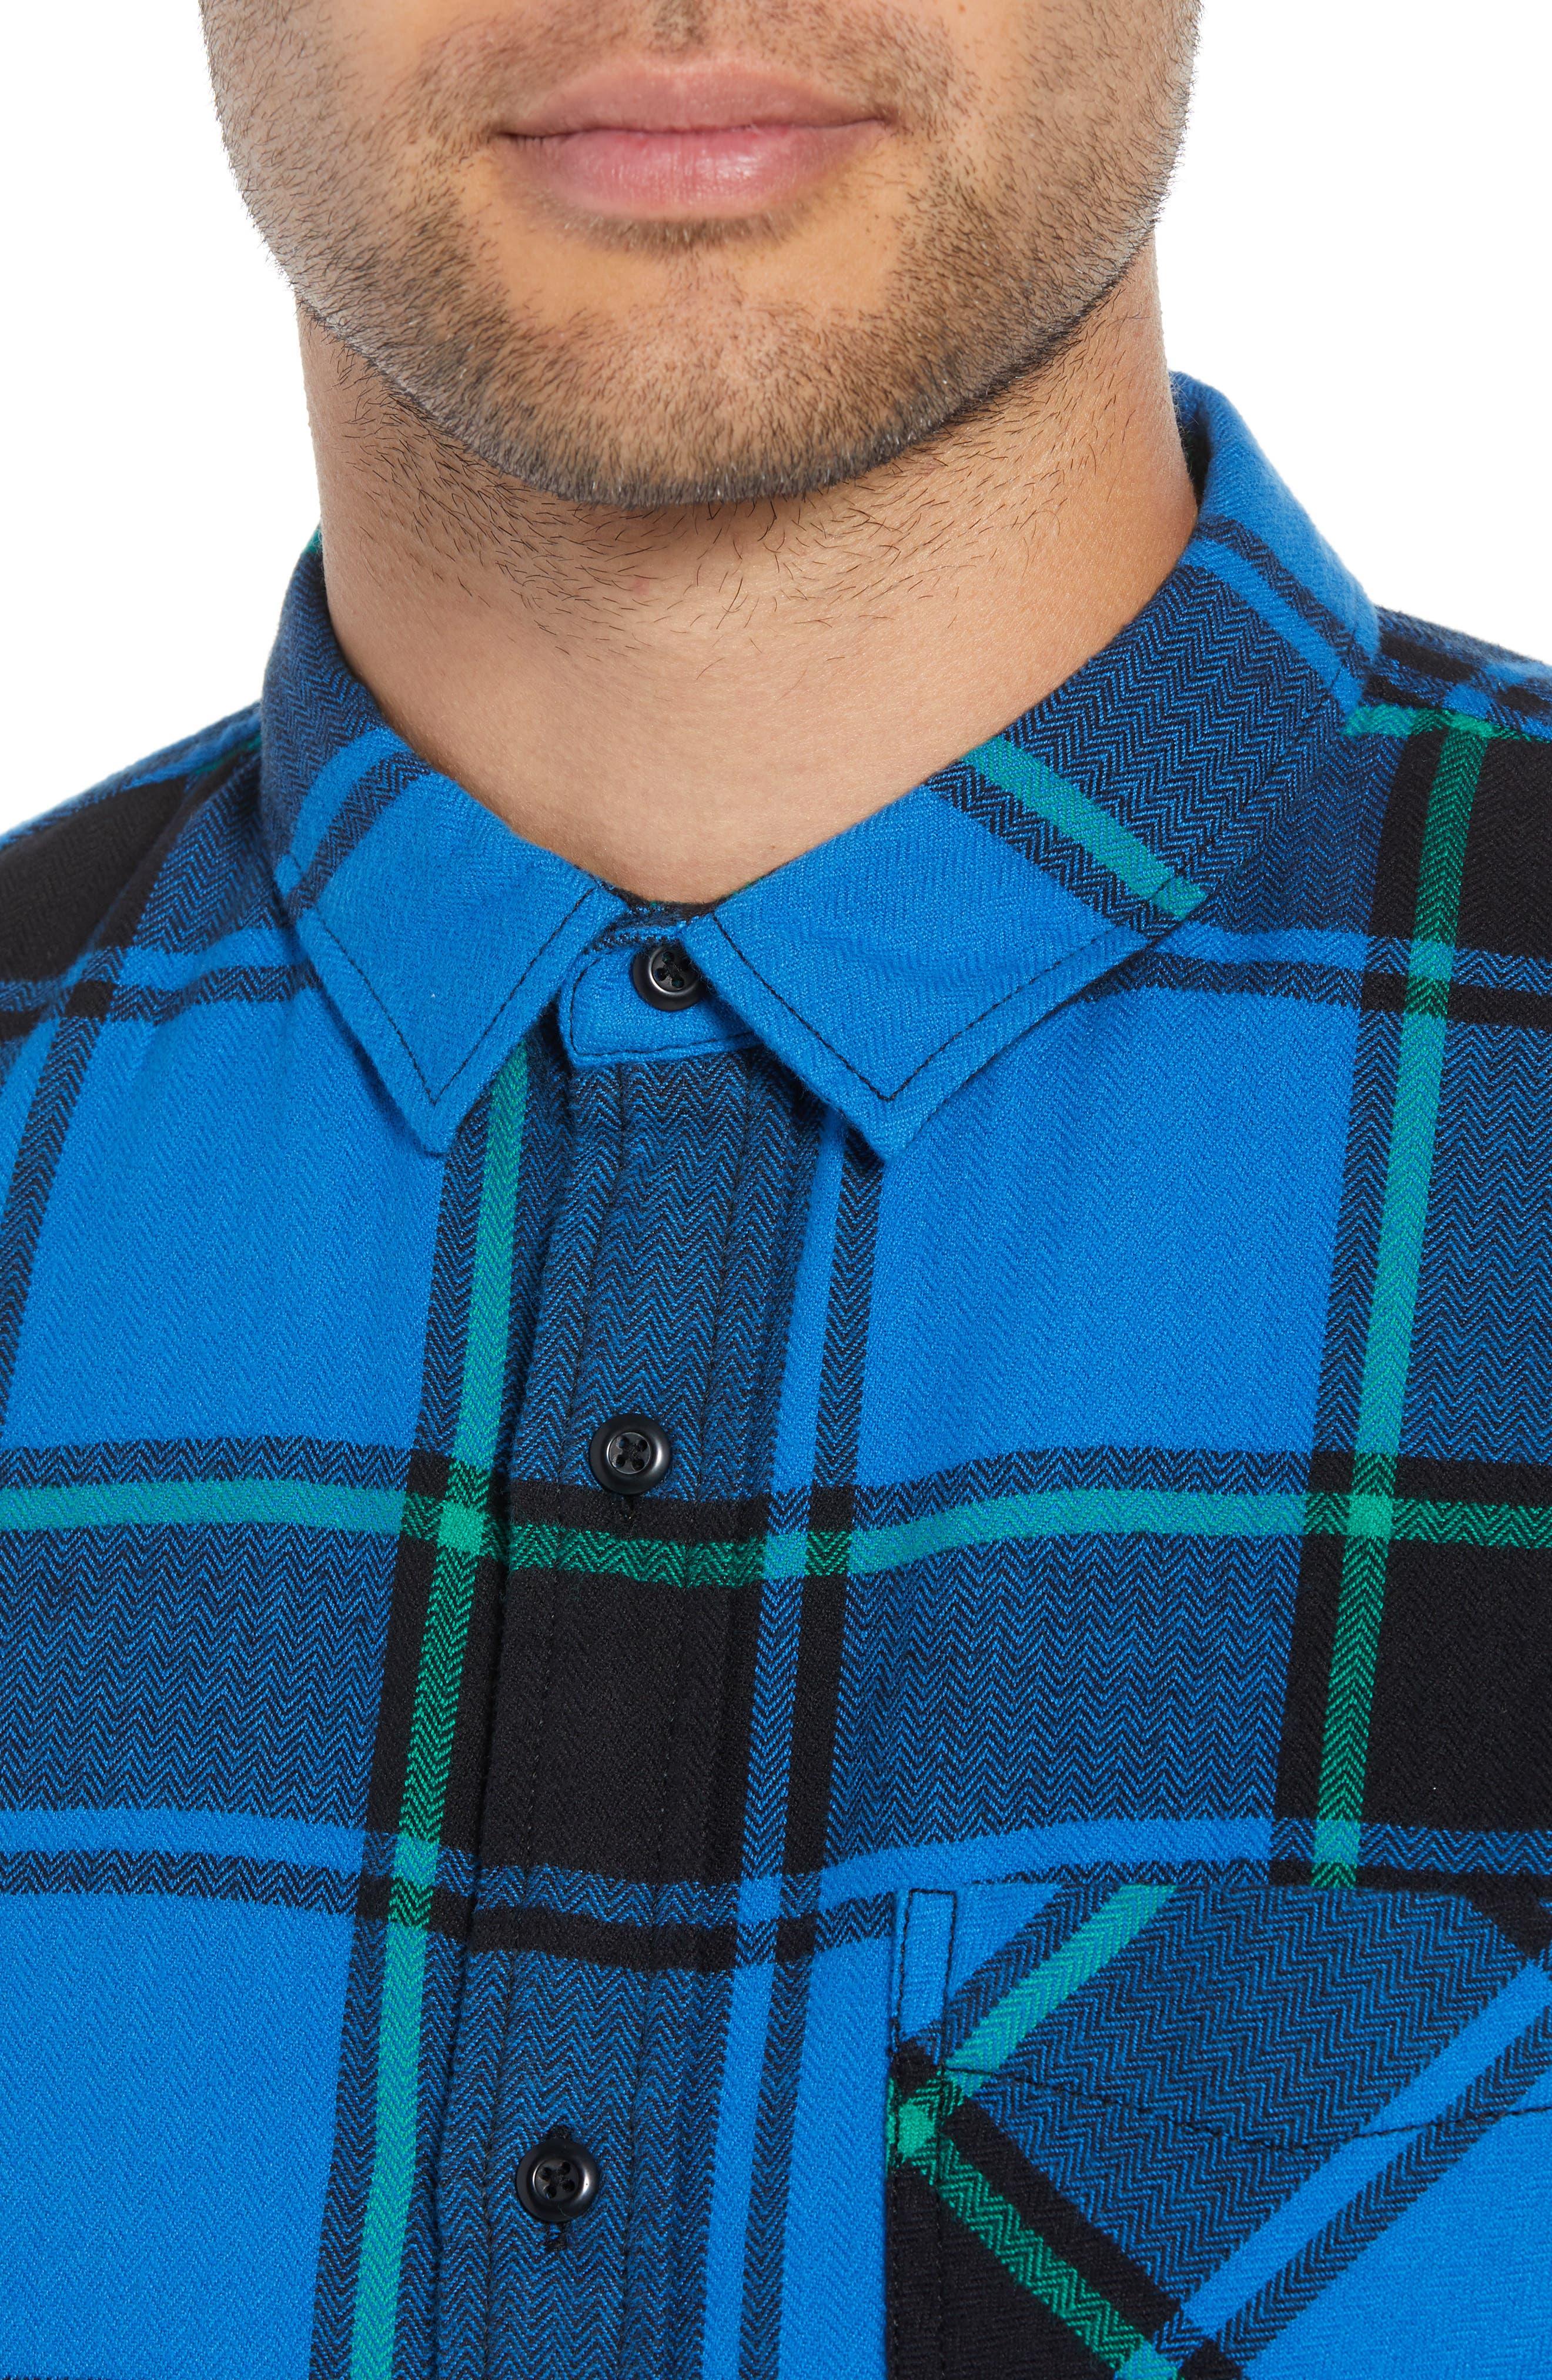 Plaid Flannel Shirt,                             Alternate thumbnail 4, color,                             BLUE BLACK REESE PLAID